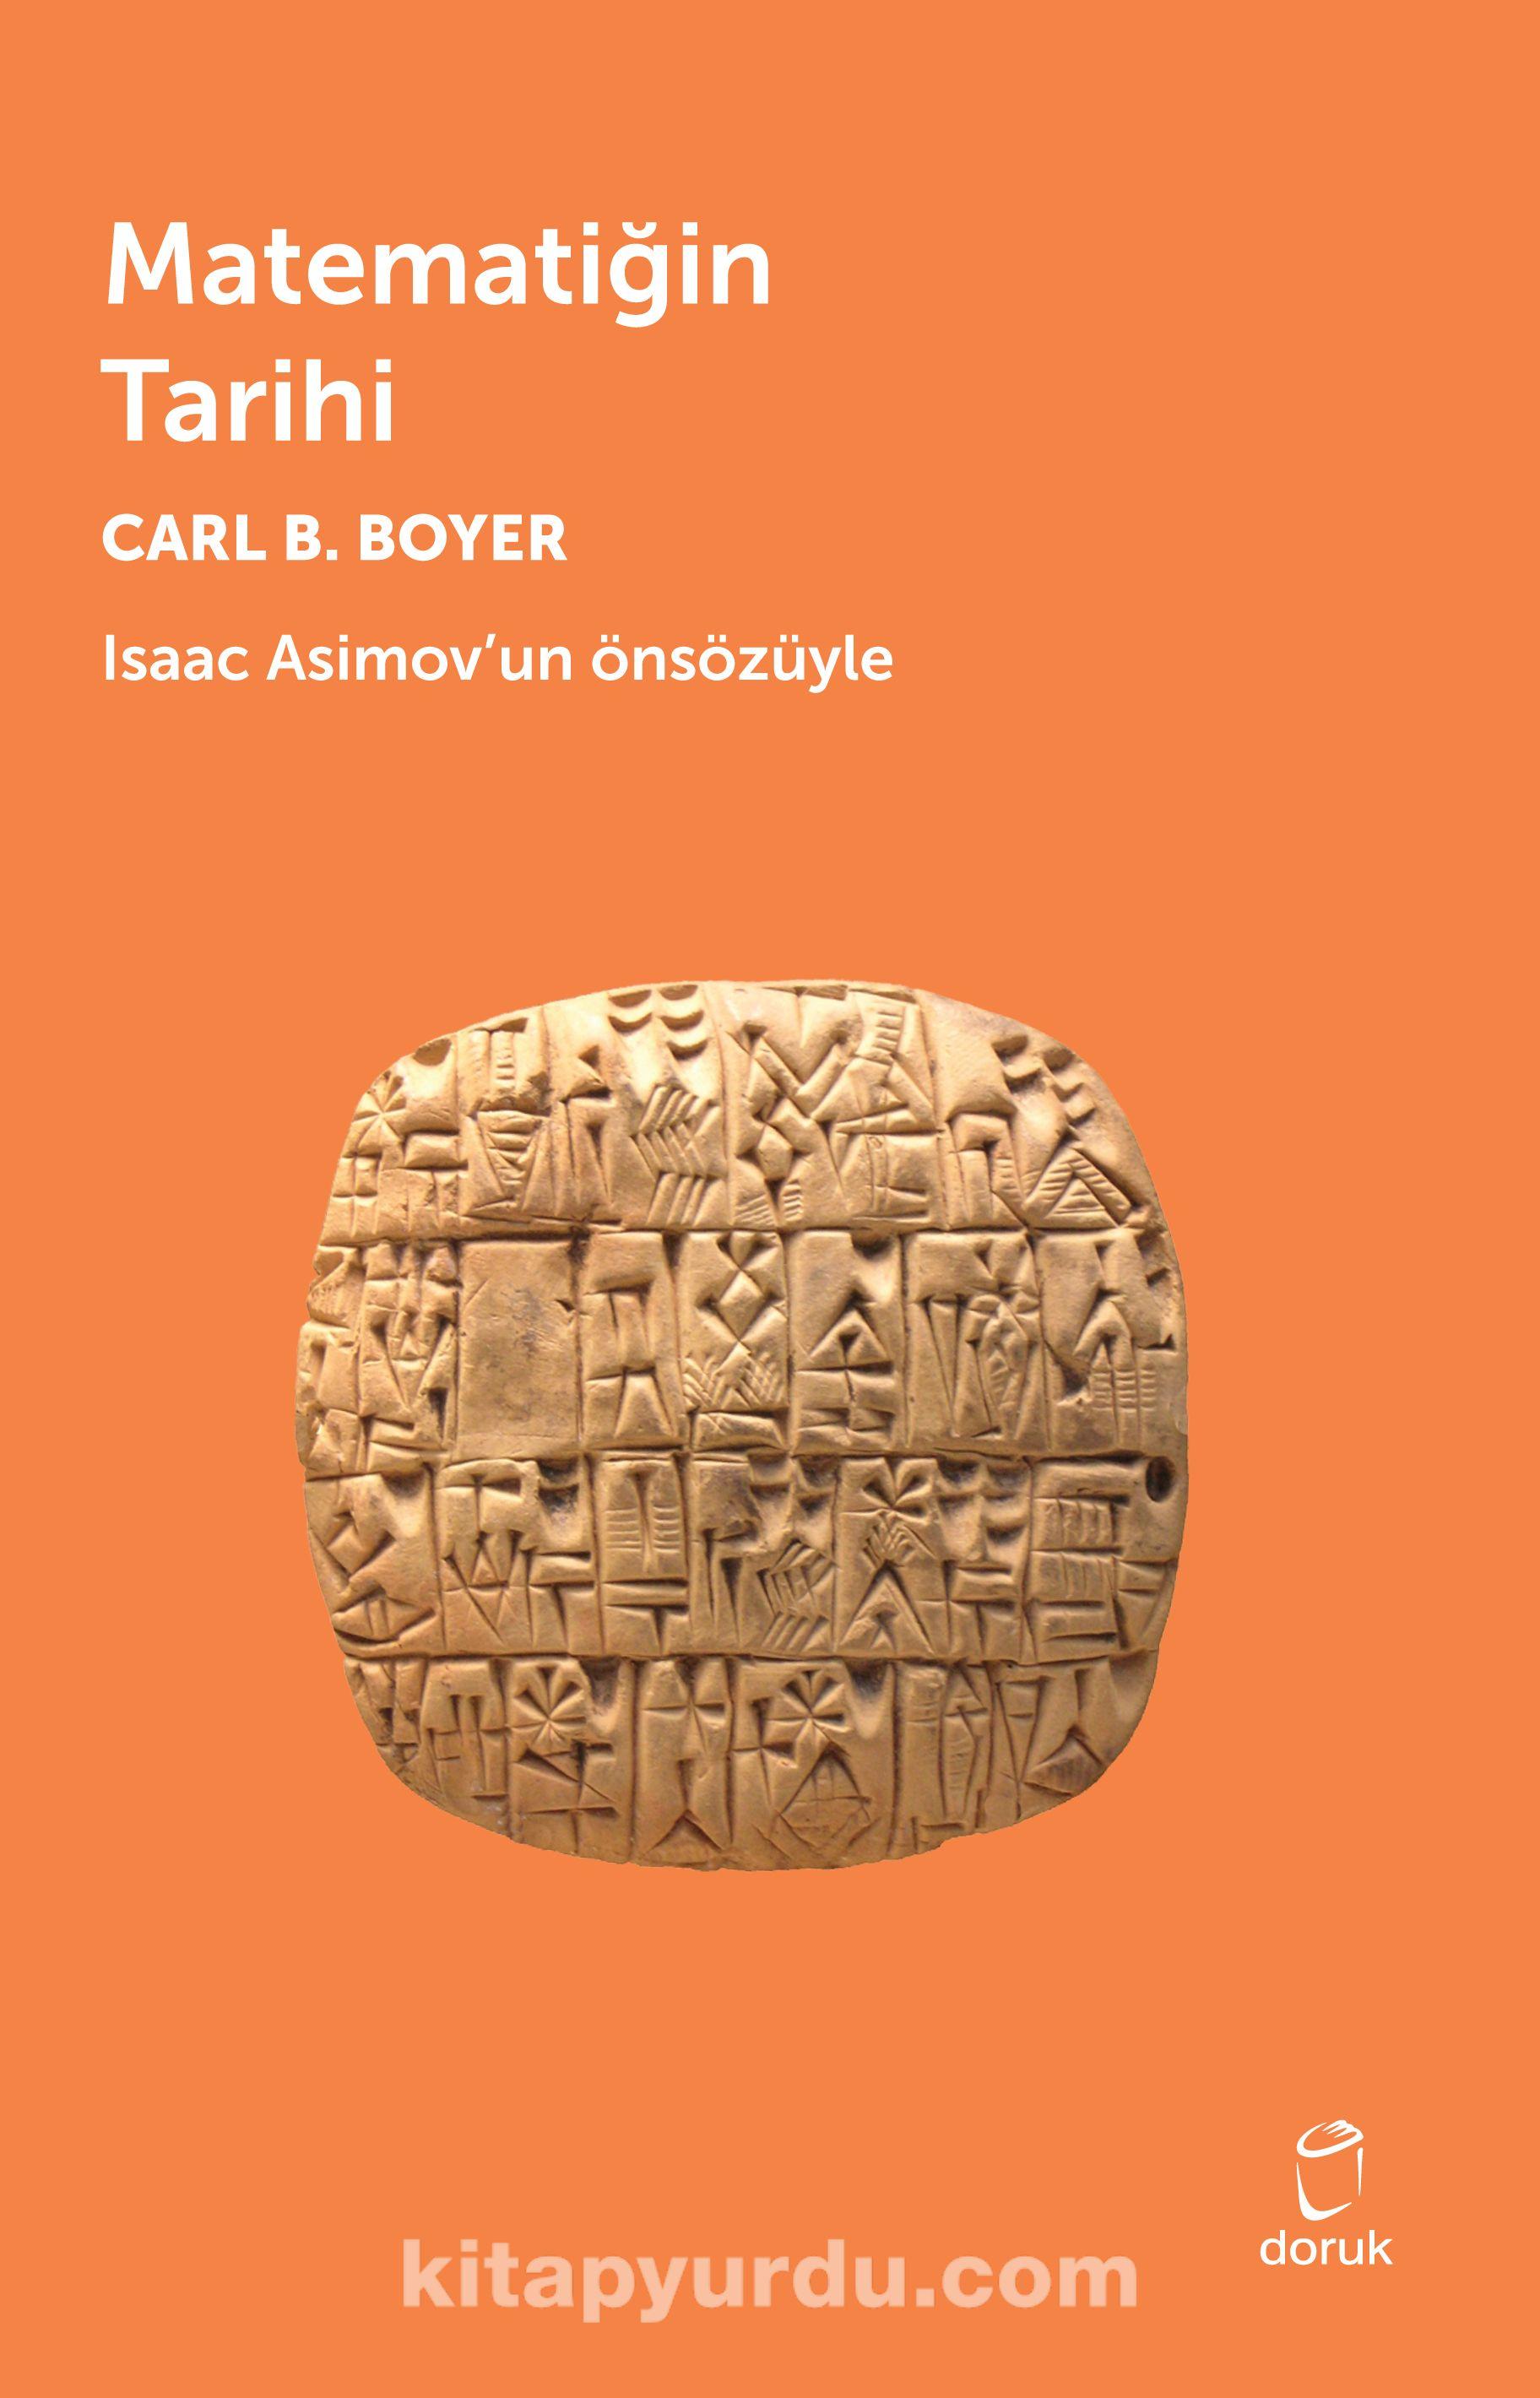 Matematiğin Tarihi